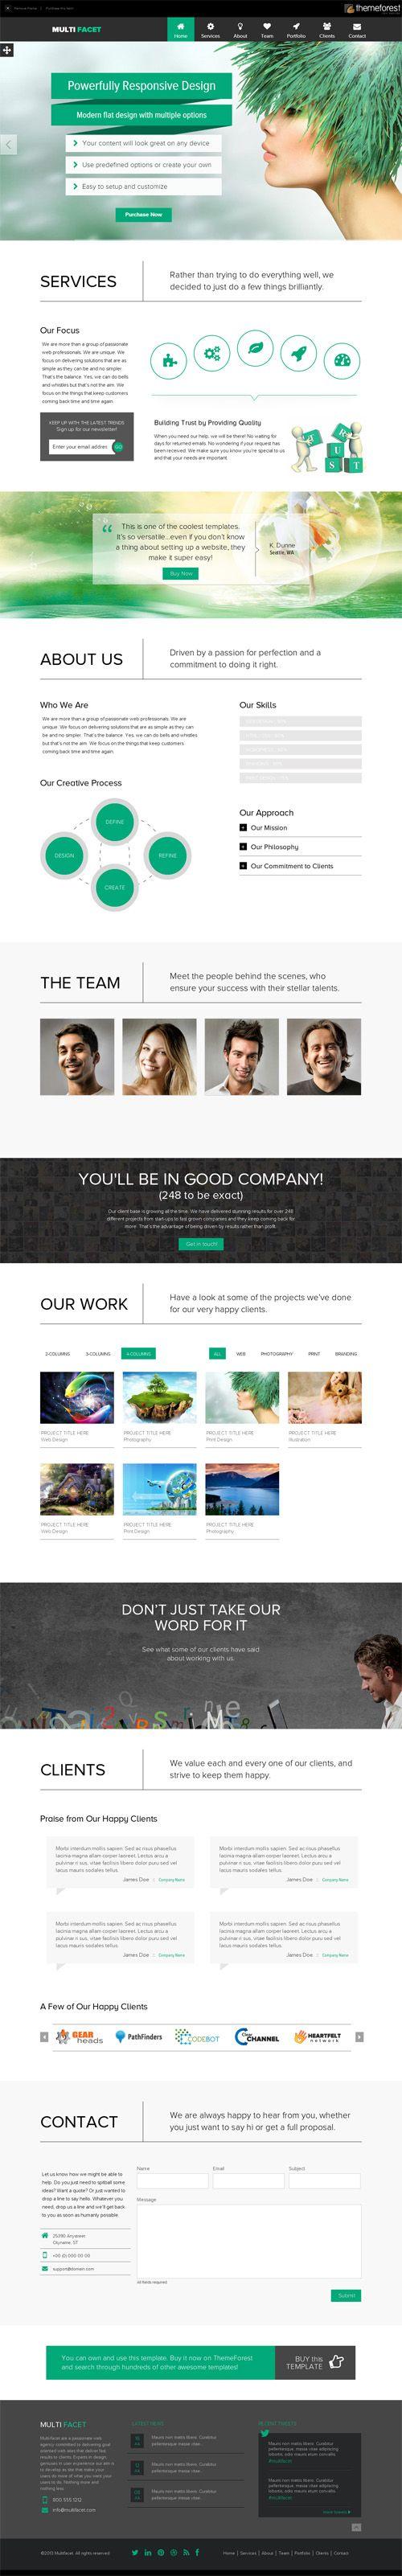 Responsive One Page Templates Permium Collection Web Design Web Graphic Design Web Layout Design